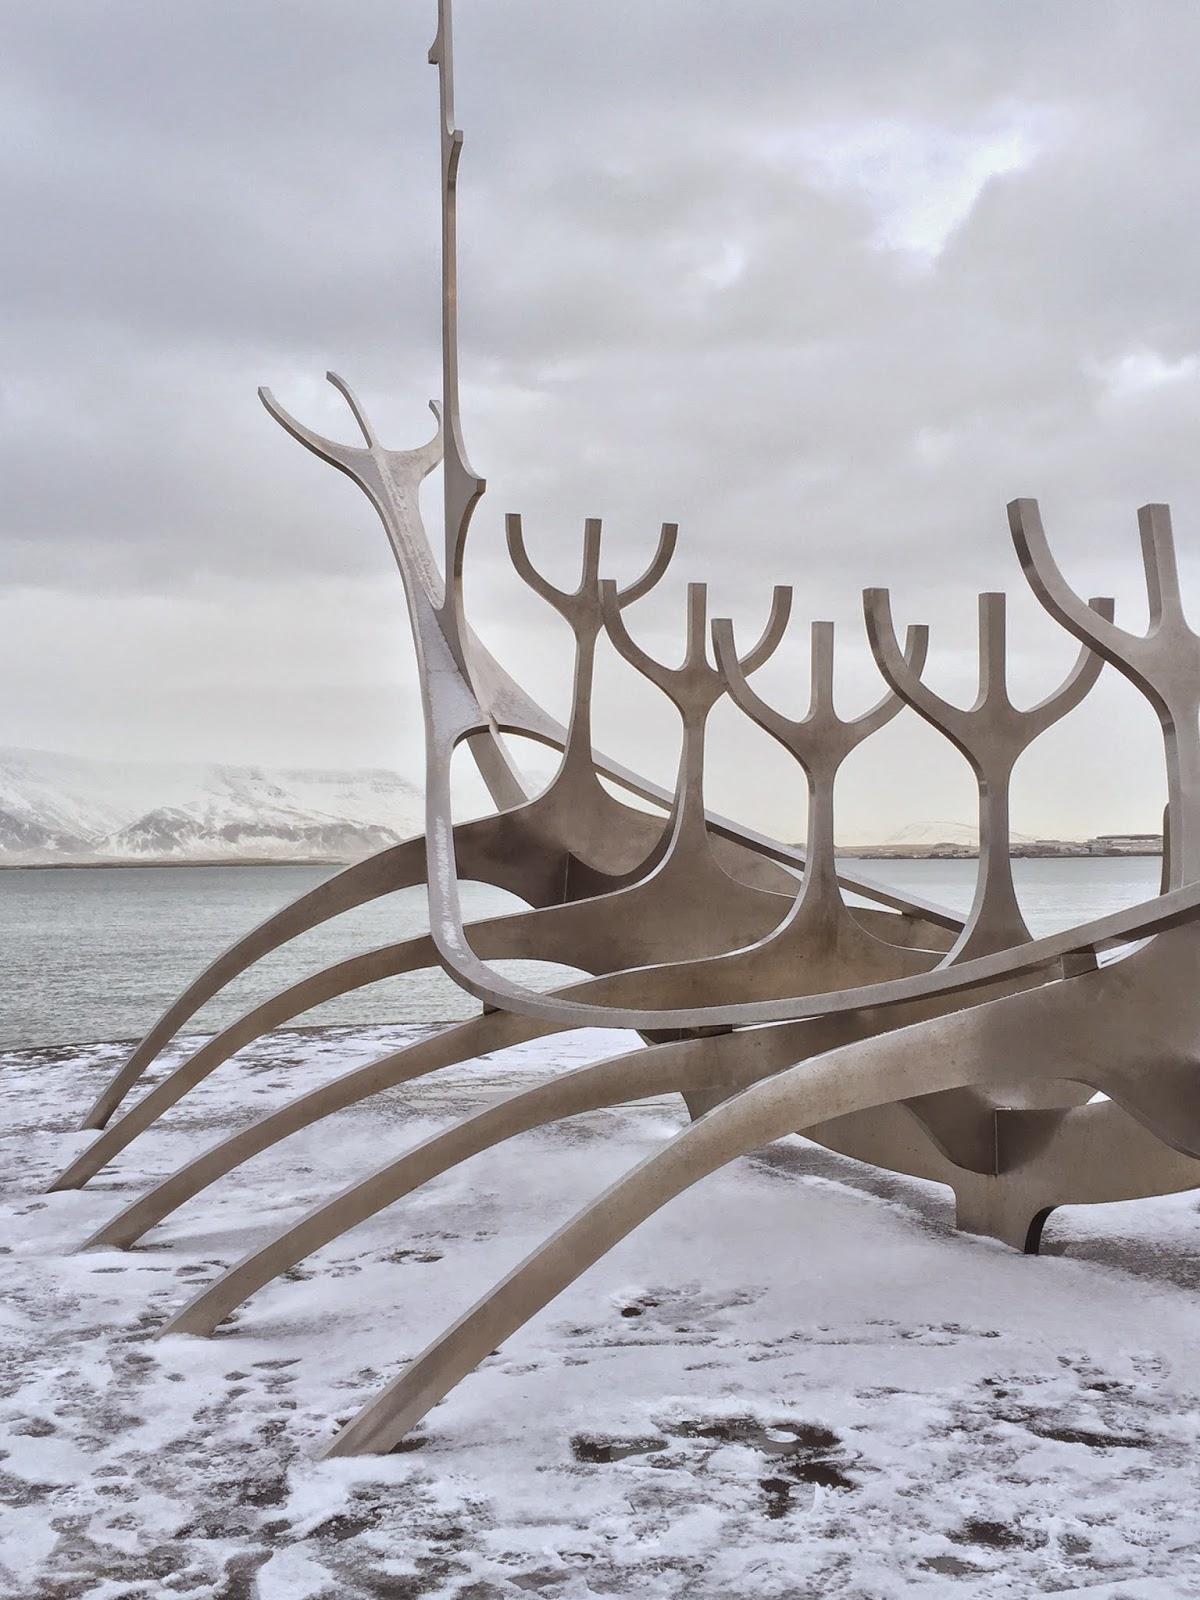 Solfar, Viking boat sculpture, Reykjavik